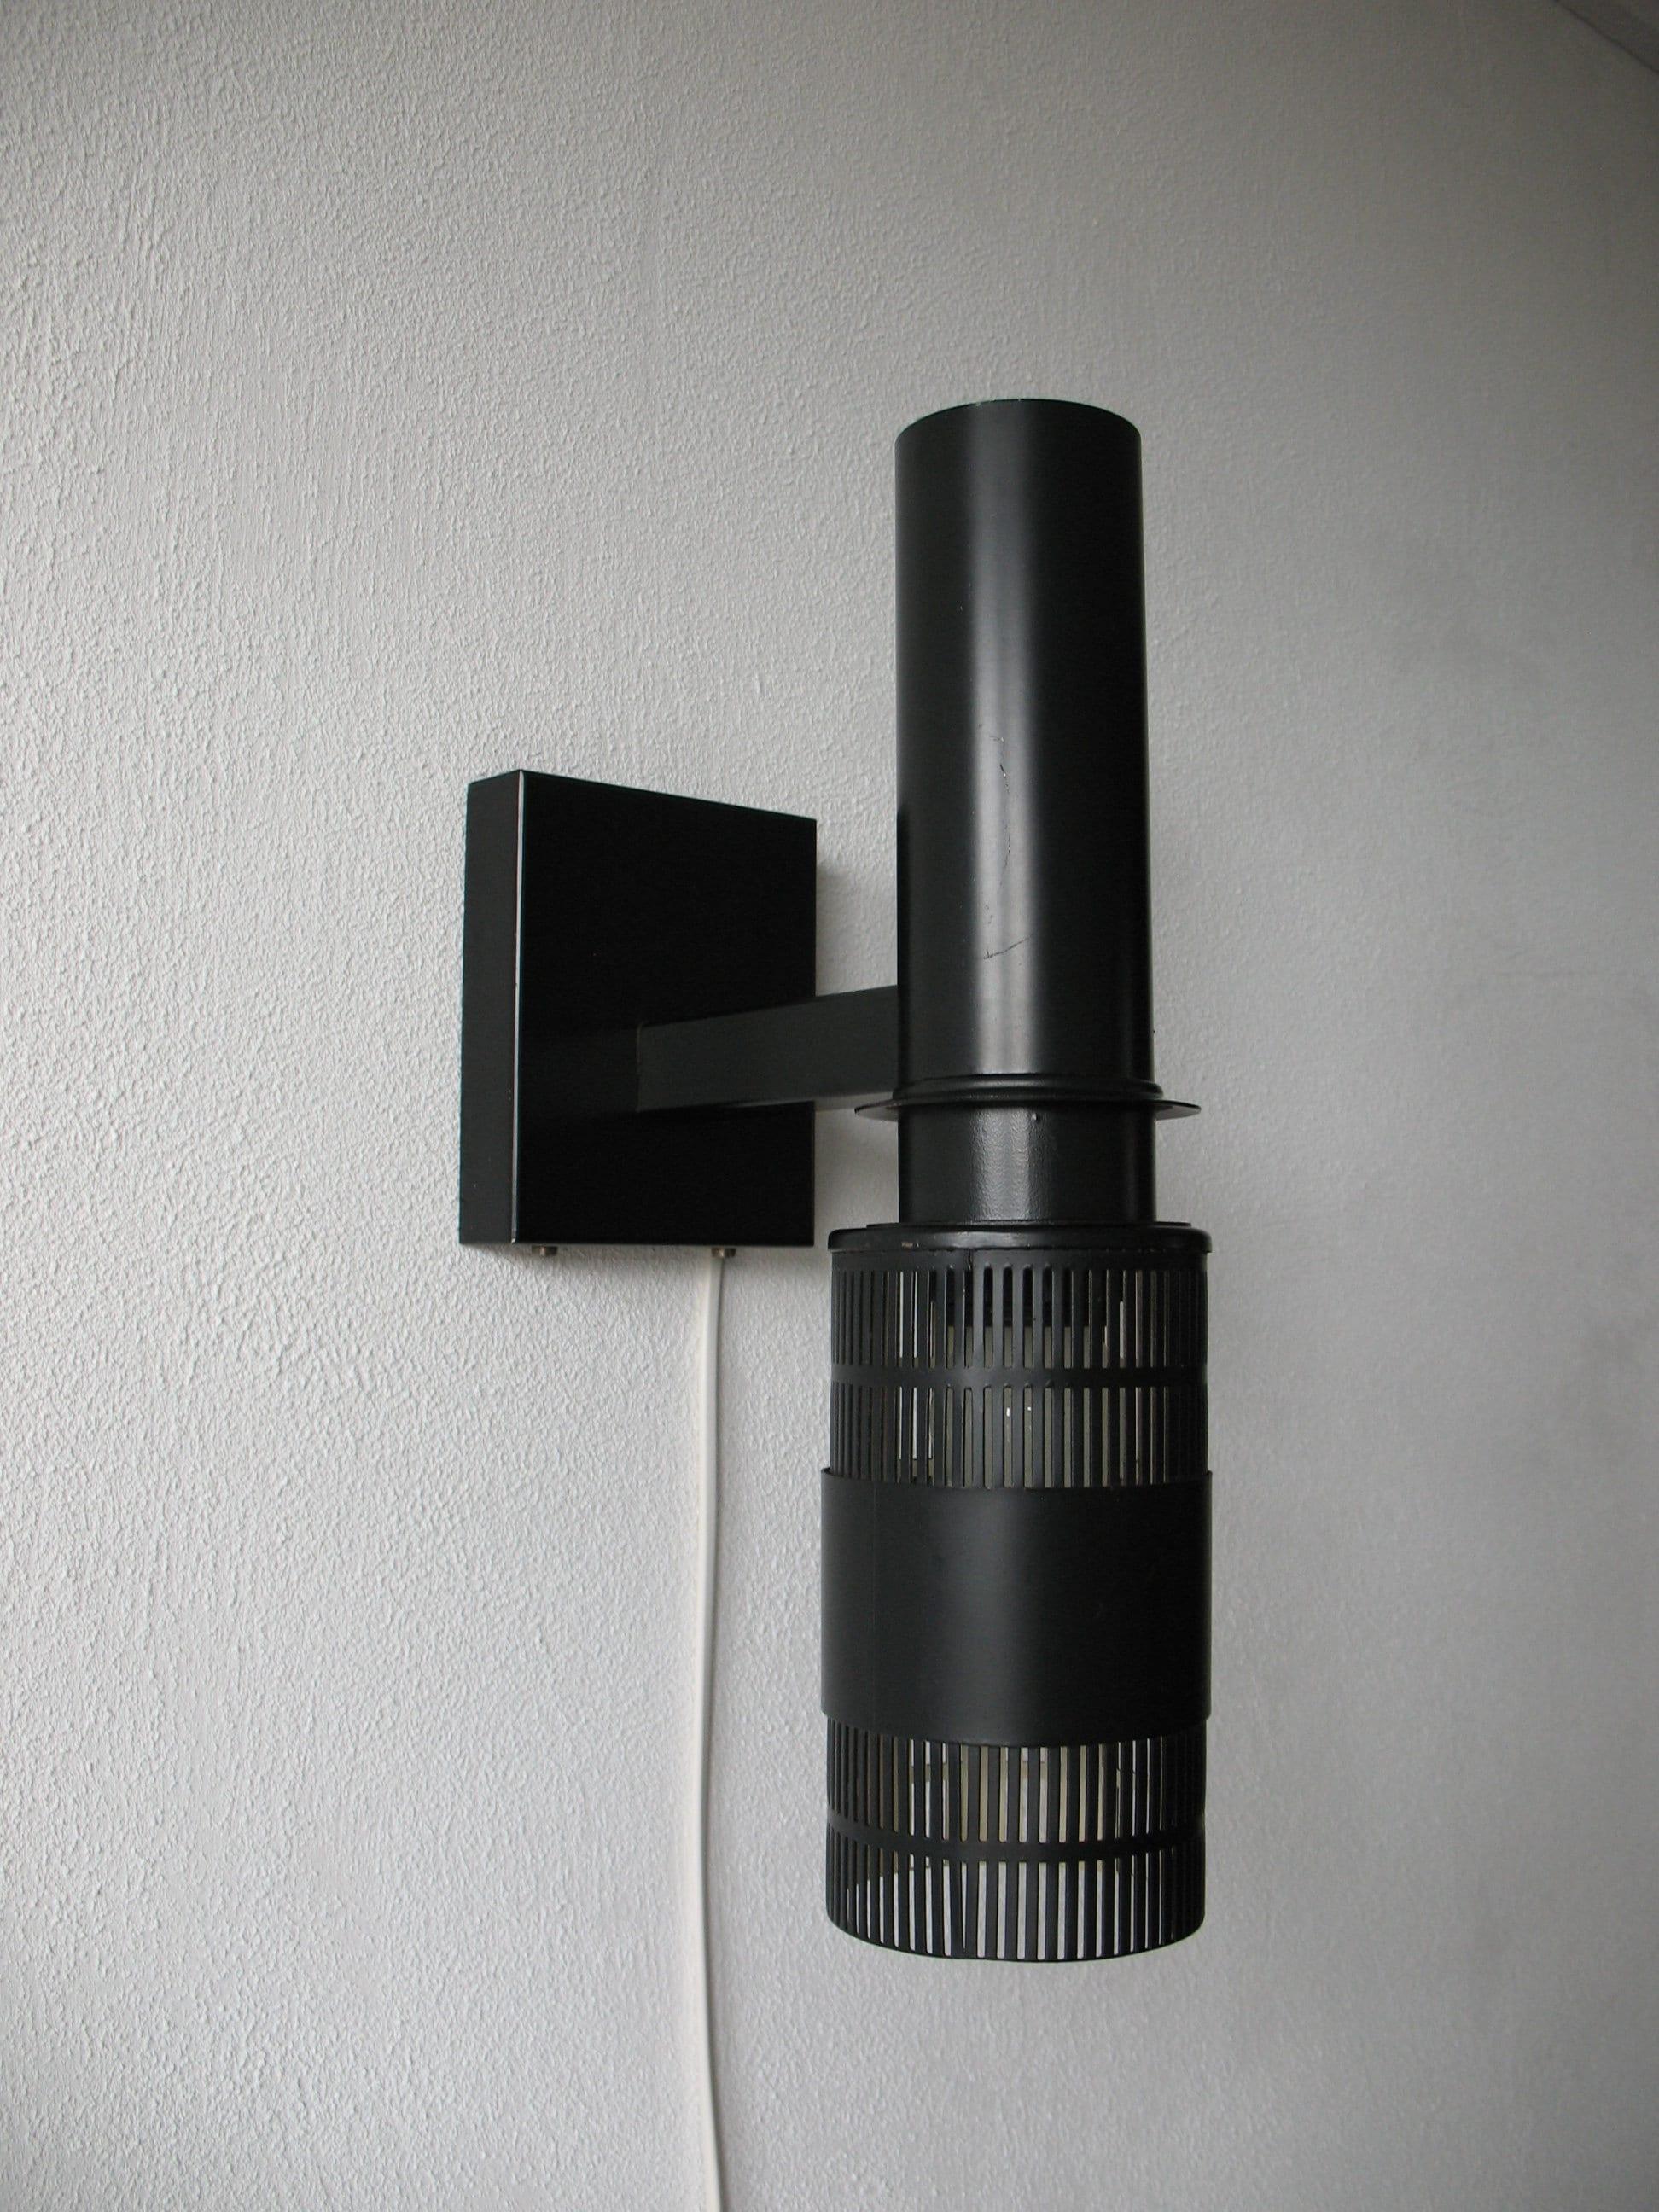 Rara lampada Philips  Moderna luce pendente degli anni